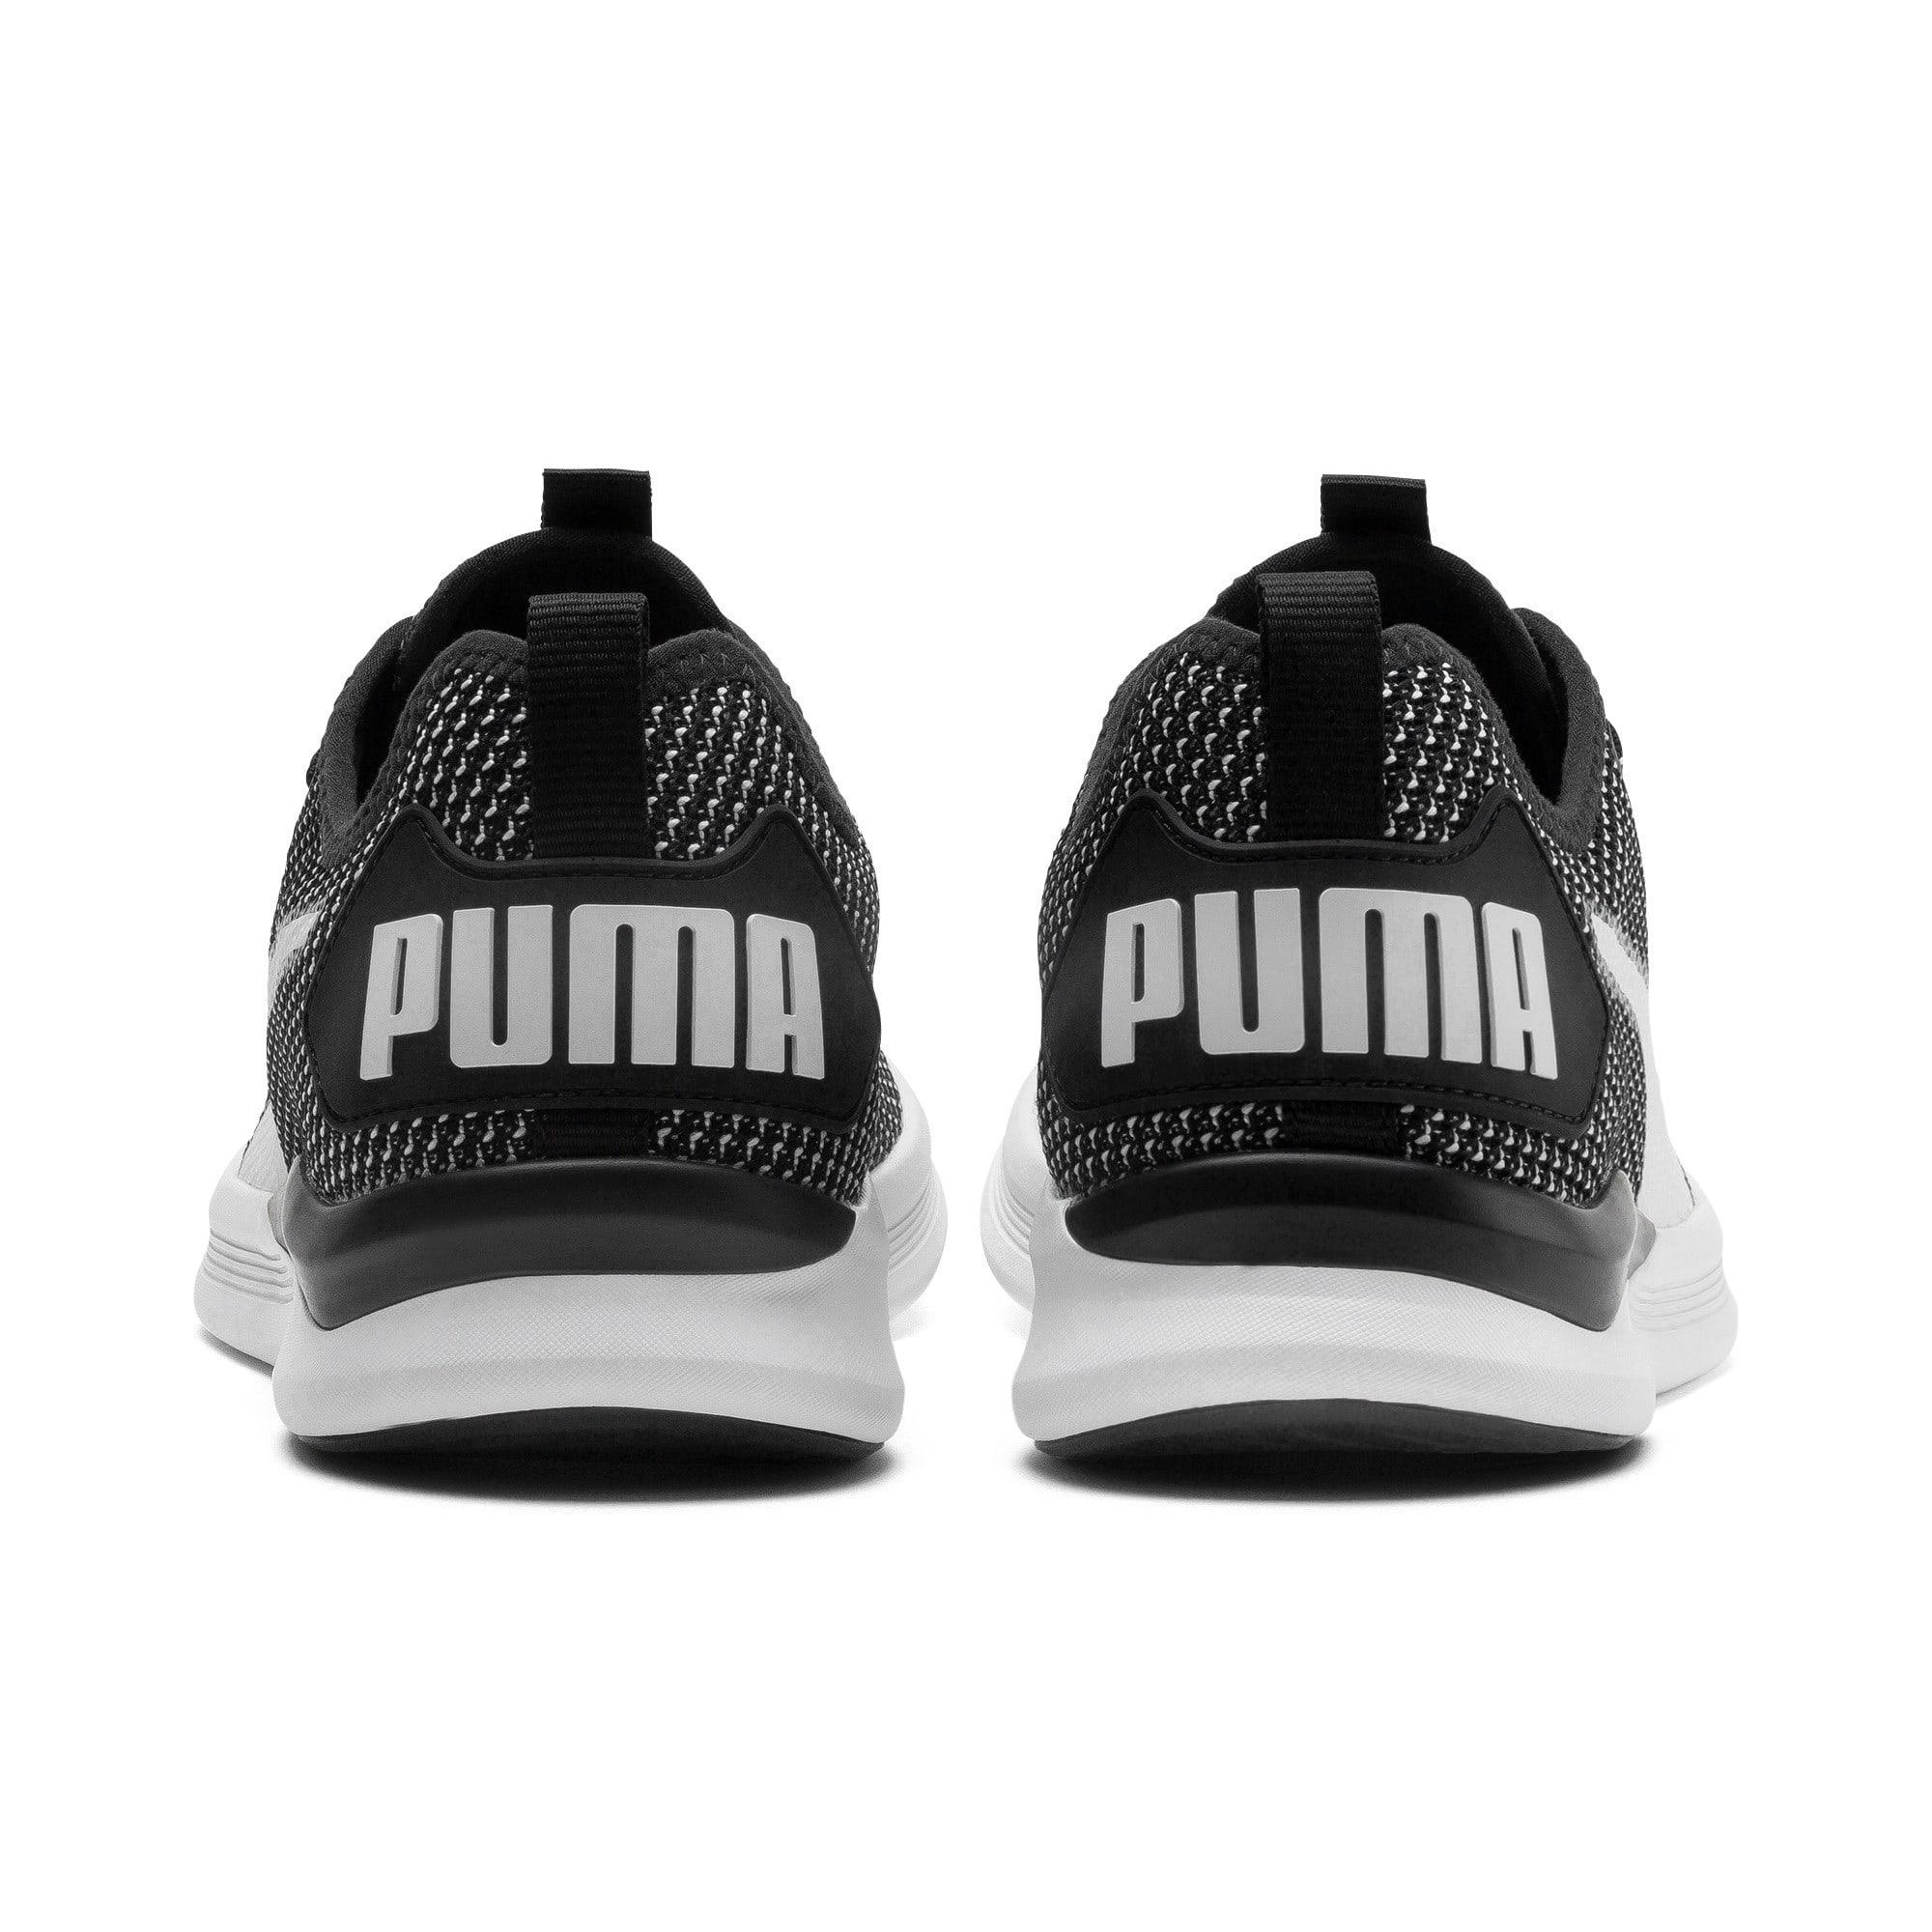 Thumbnail 3 of Scarpe Running IGNITE Flash FS uomo, Puma Black-Puma White, medium